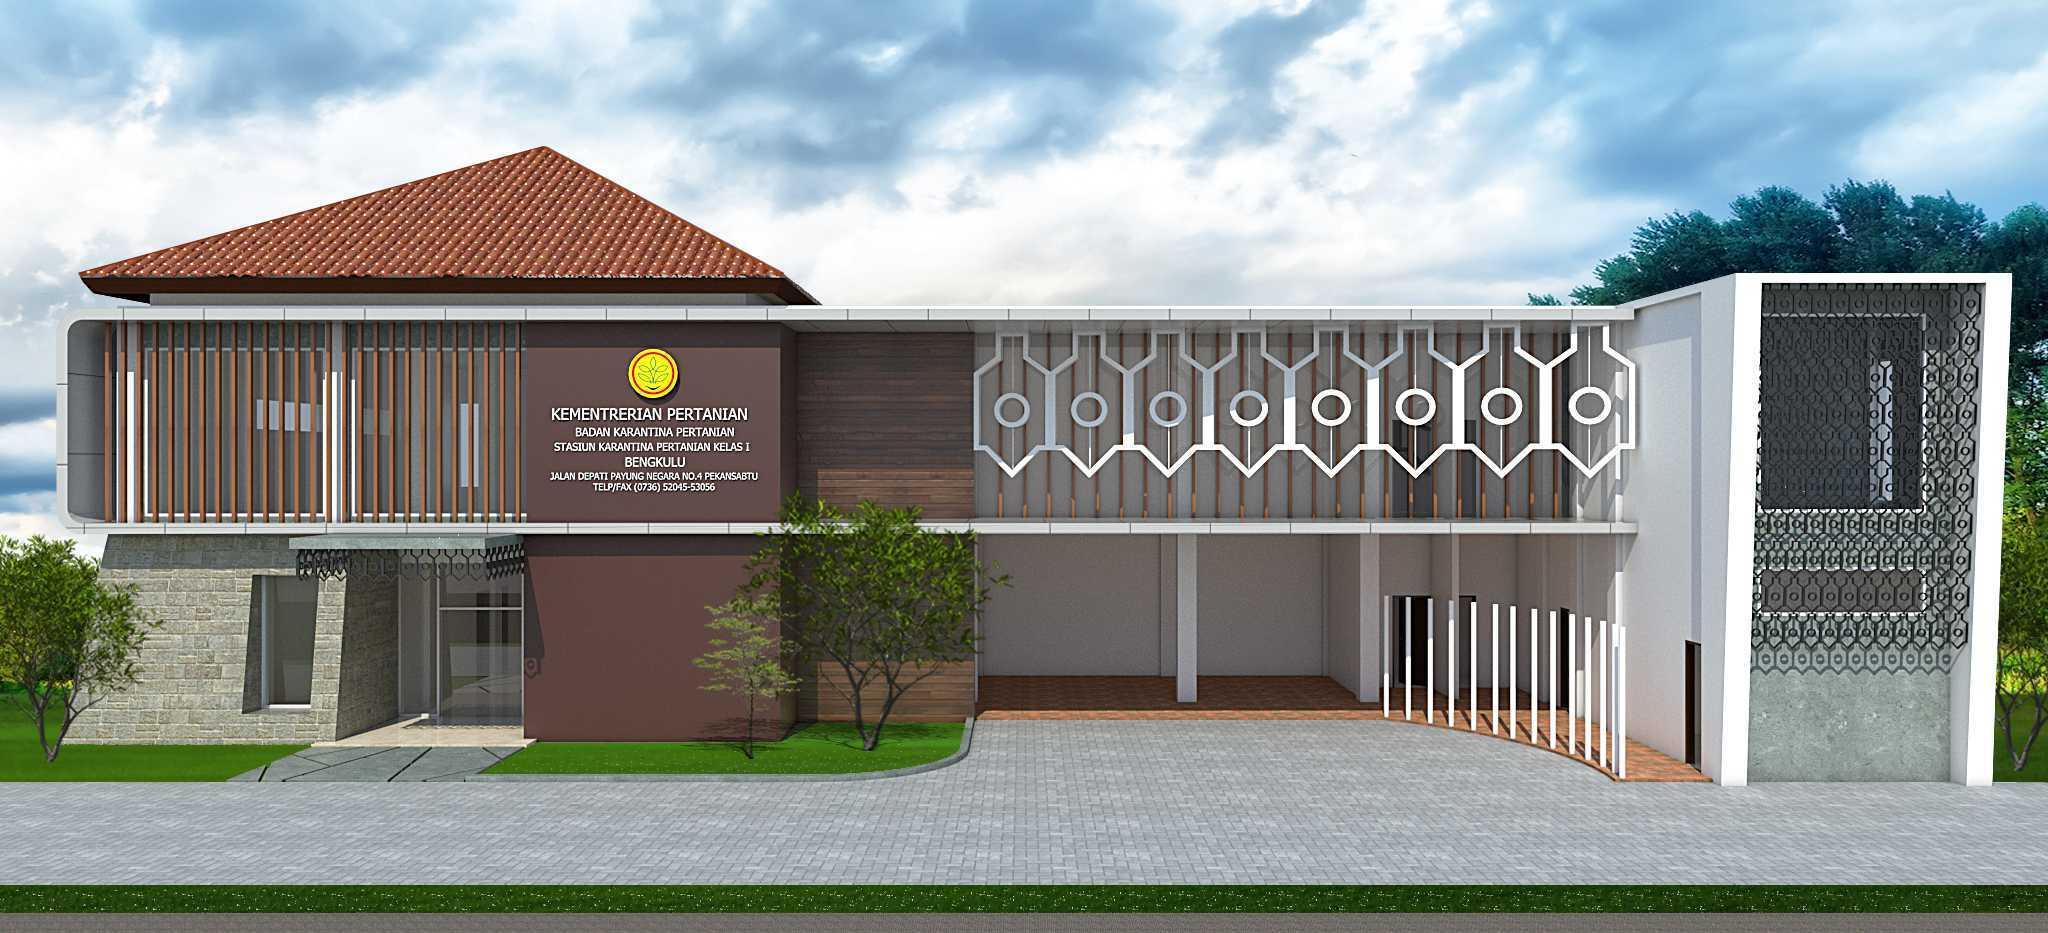 Ivan Eldo Kantor Kementerian Pertanian Bengkulu Bengkulu, Indonesia Bengkulu, Indonesia Ivan-Eldo-Kantor-Kementerian-Pertanian-Bengkulu   65317